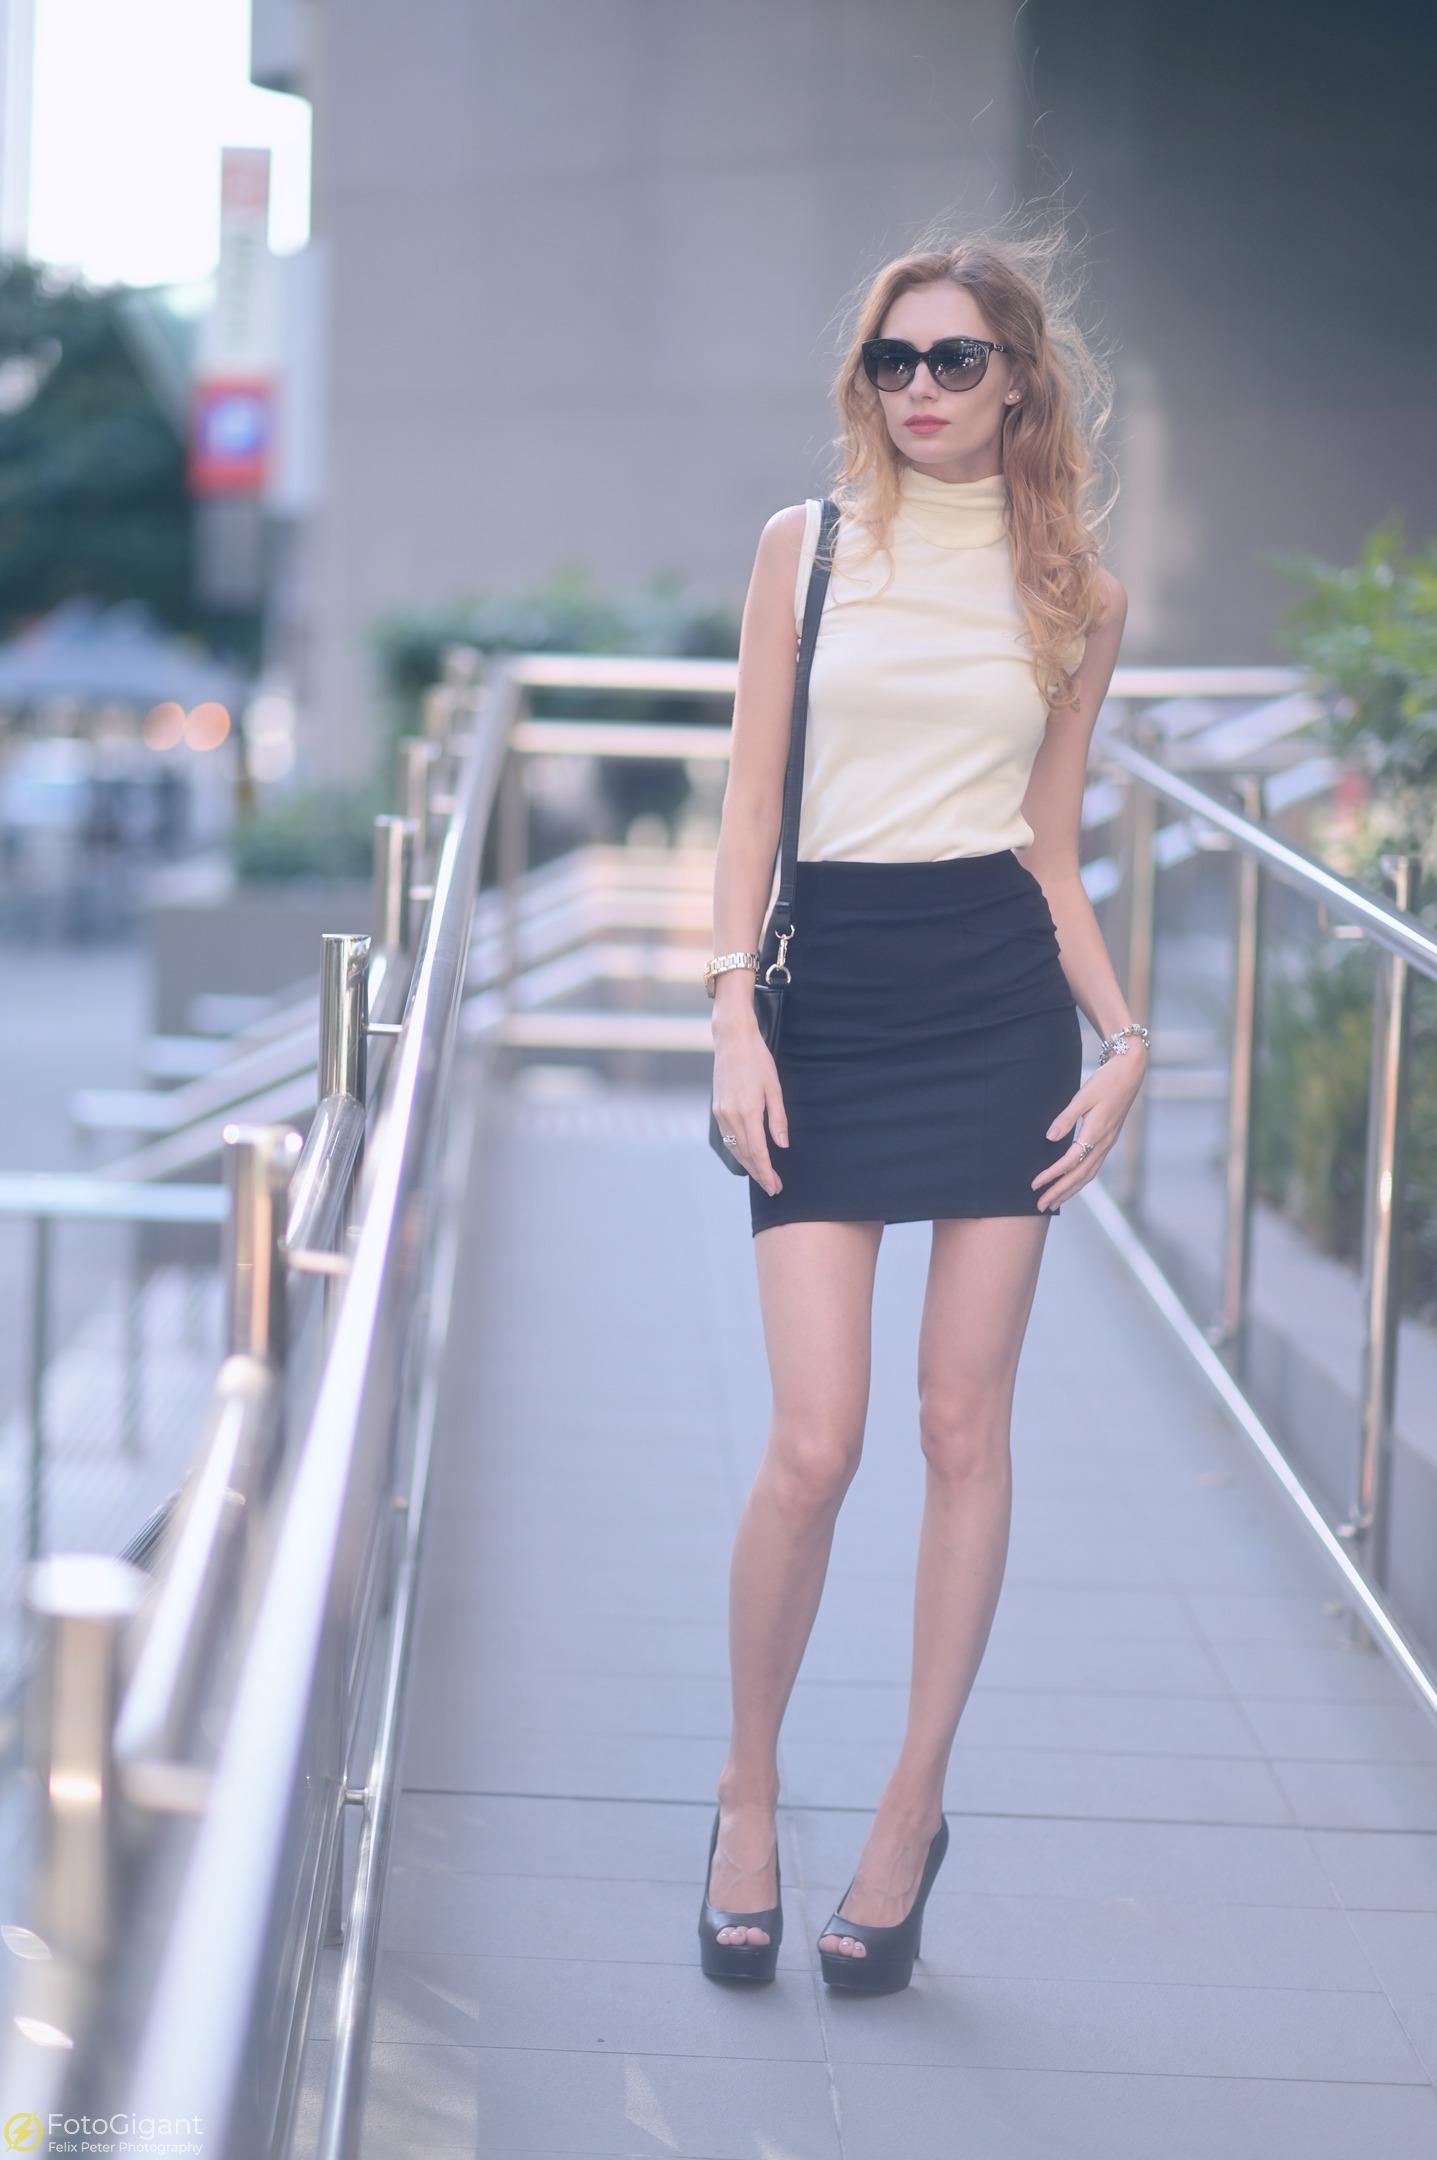 Alina_Fashion-Photography_Perth_22.jpg